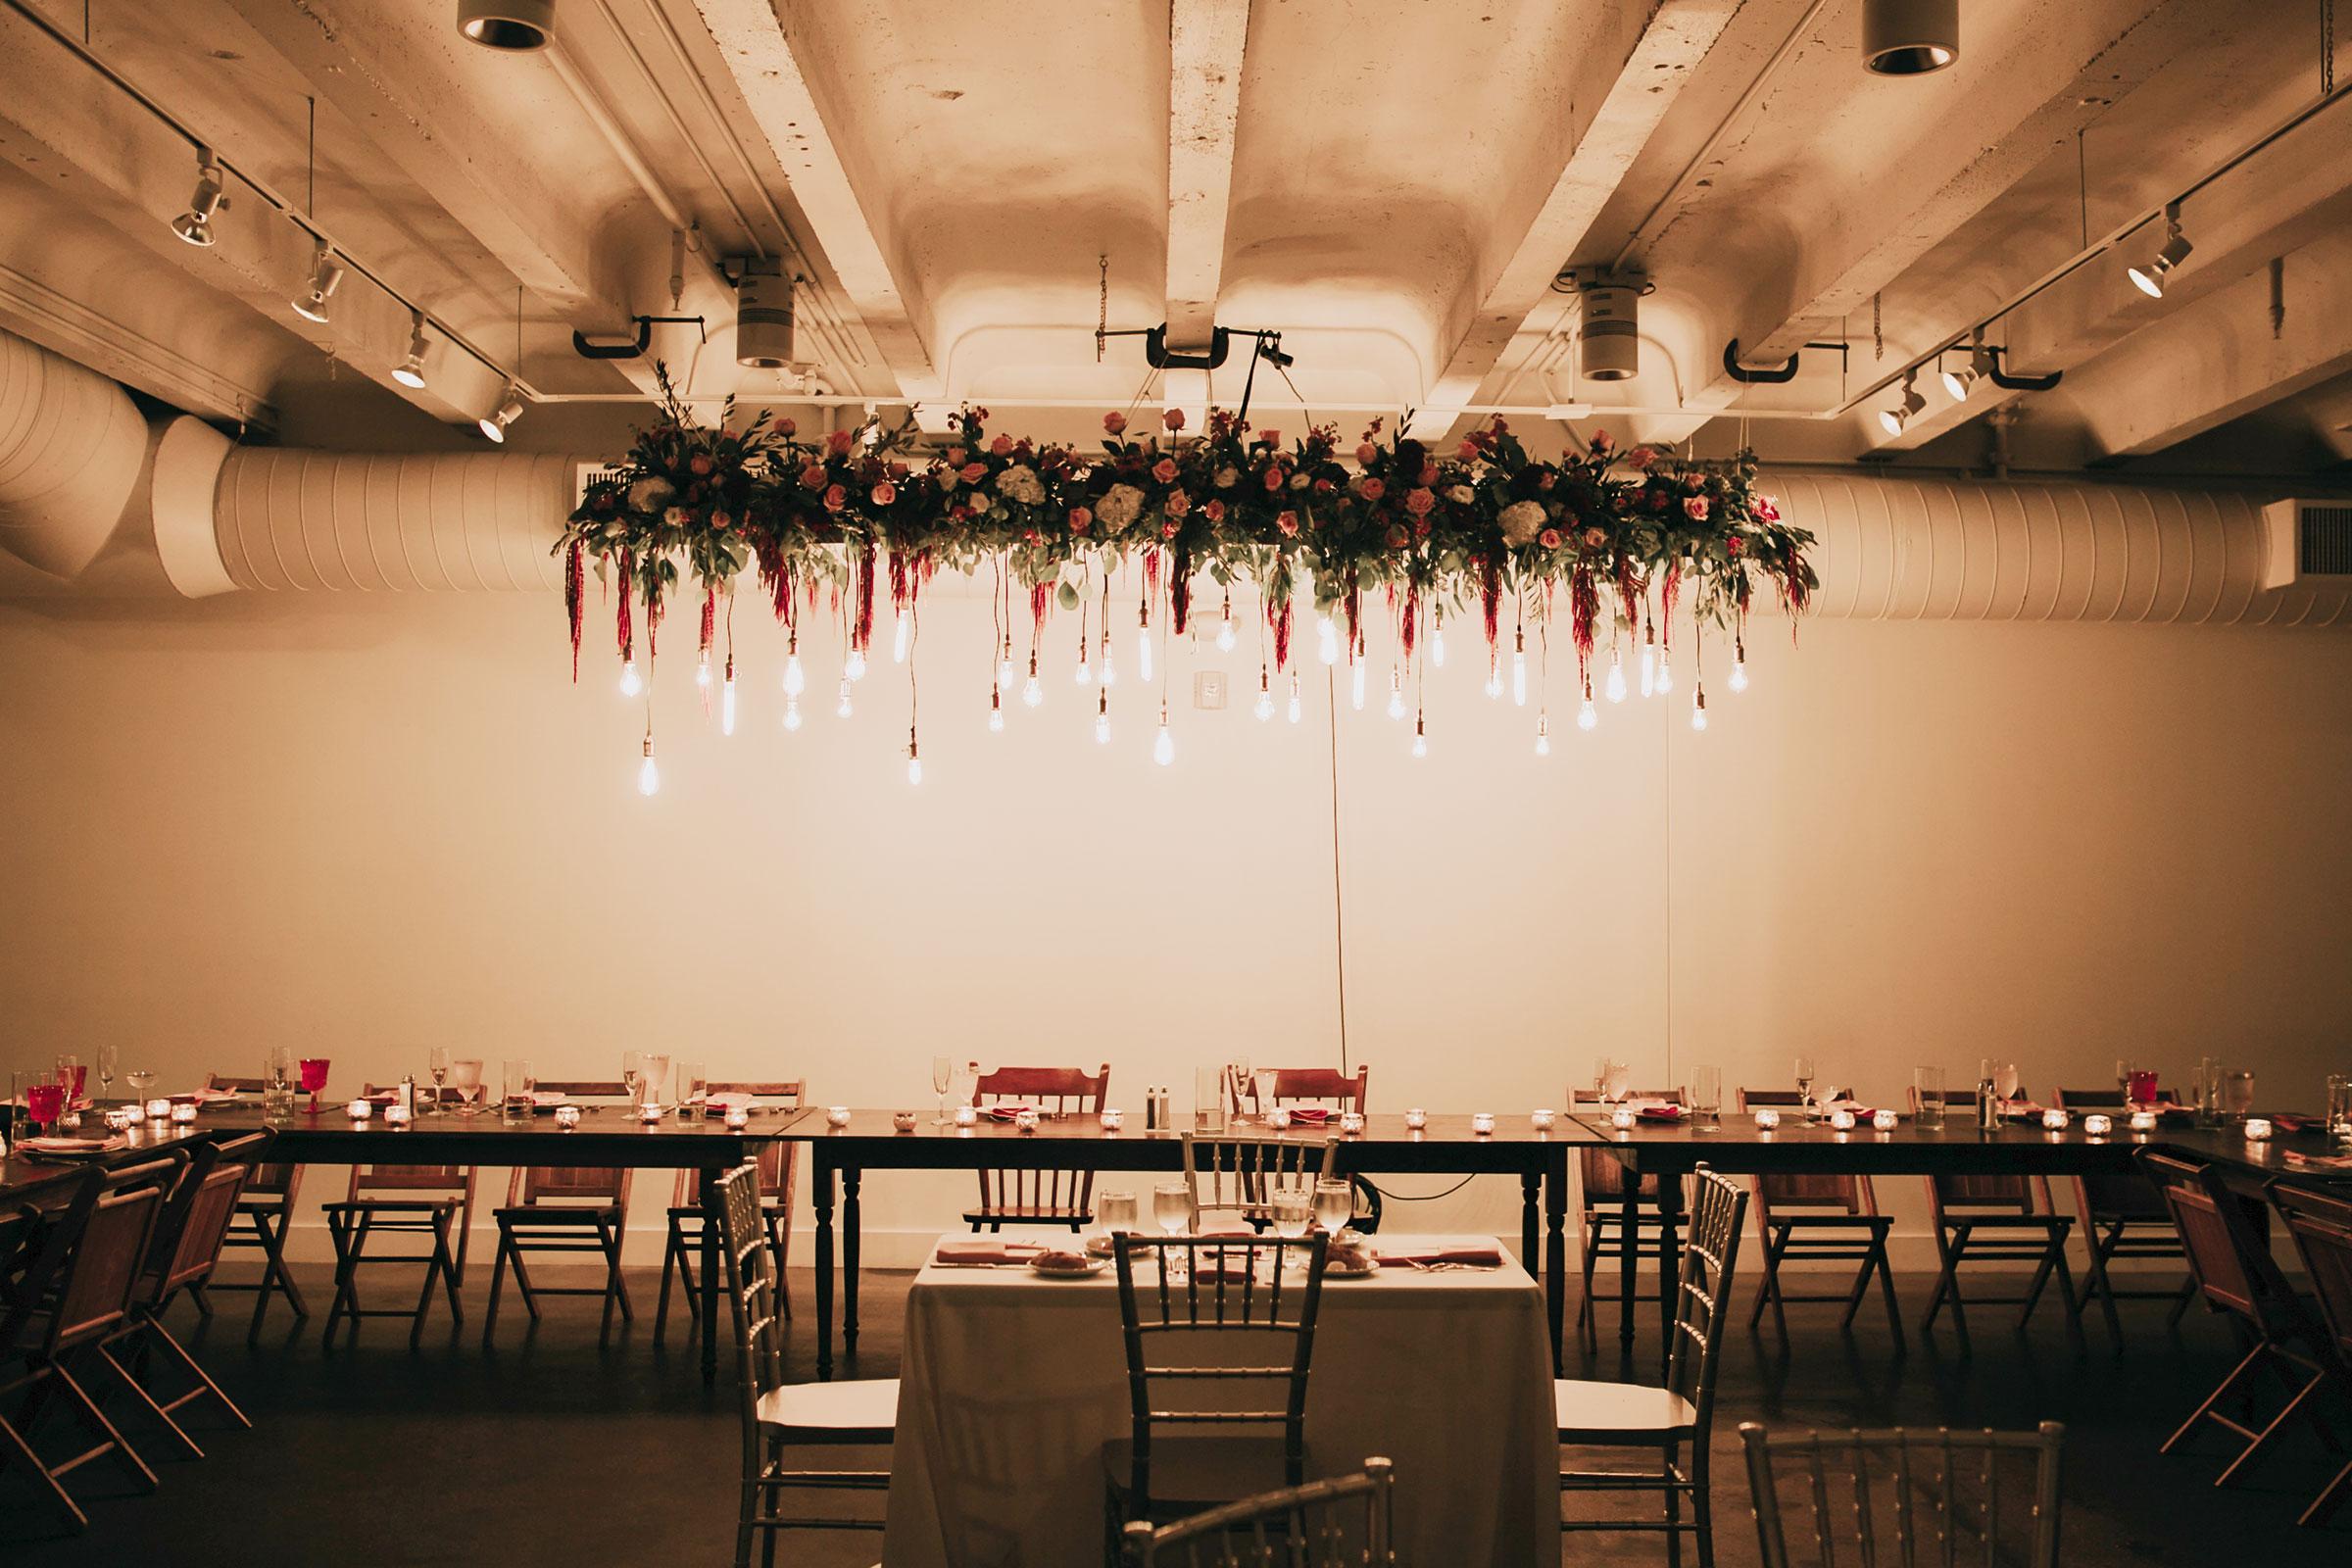 head-table-decorations-flowers-hanging-from-ceiling-founders-one-nine-omaha-nebraska-raelyn-ramey-photography.jpg